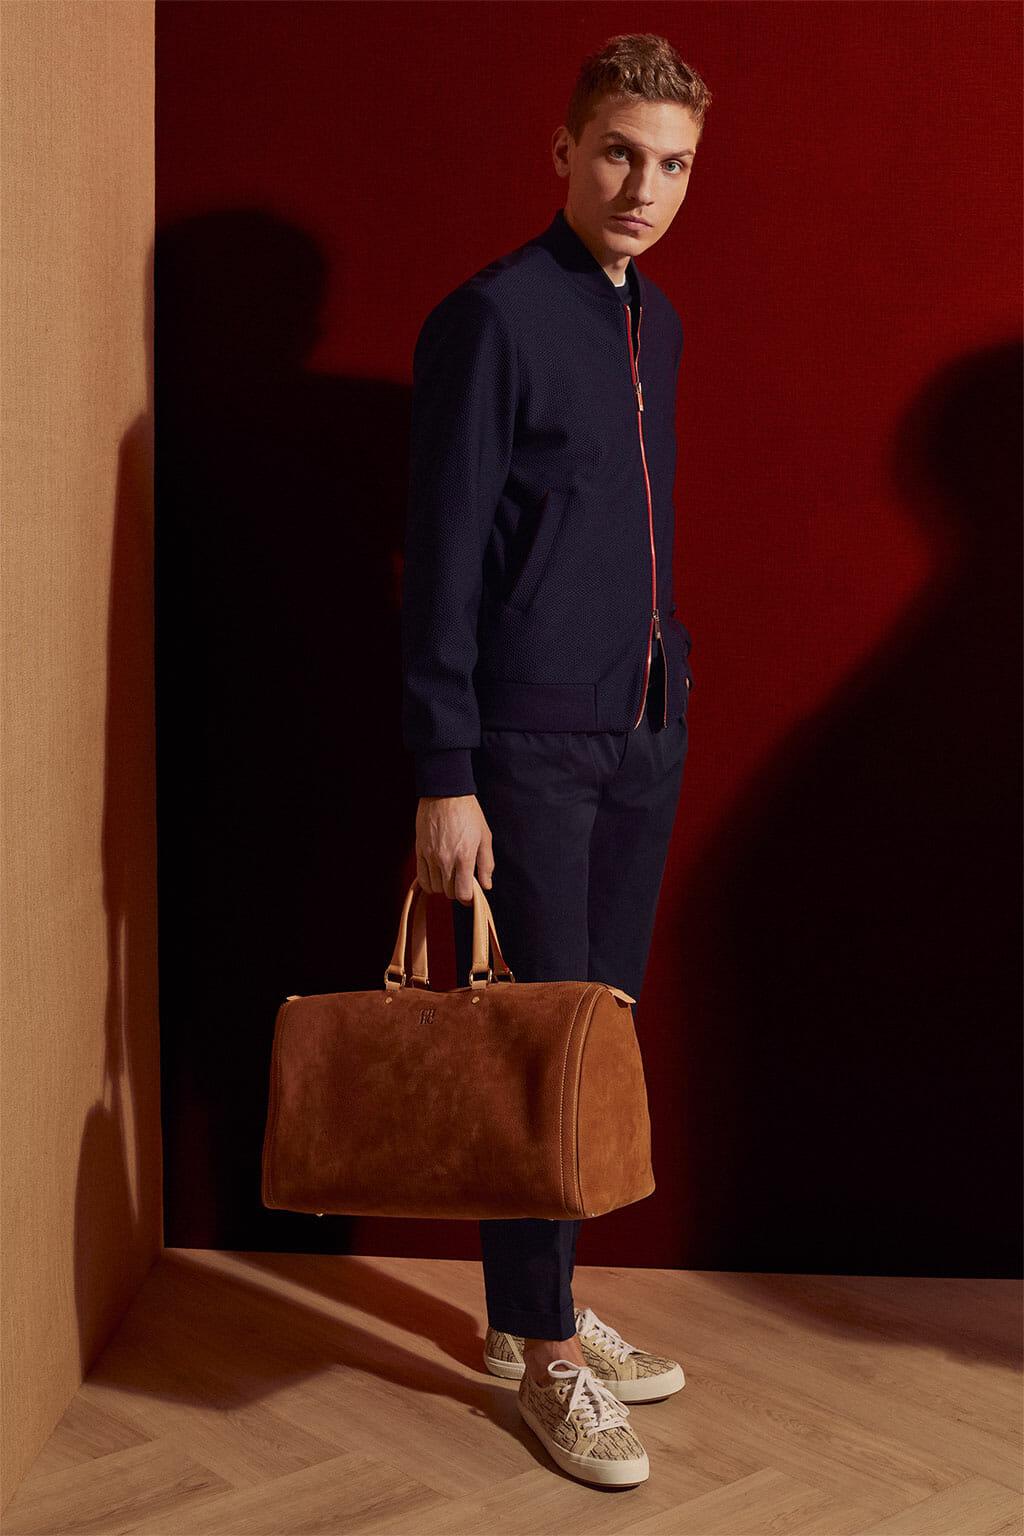 CH Carolina Herrera. New Menswear Collection Early Summer. Look 10